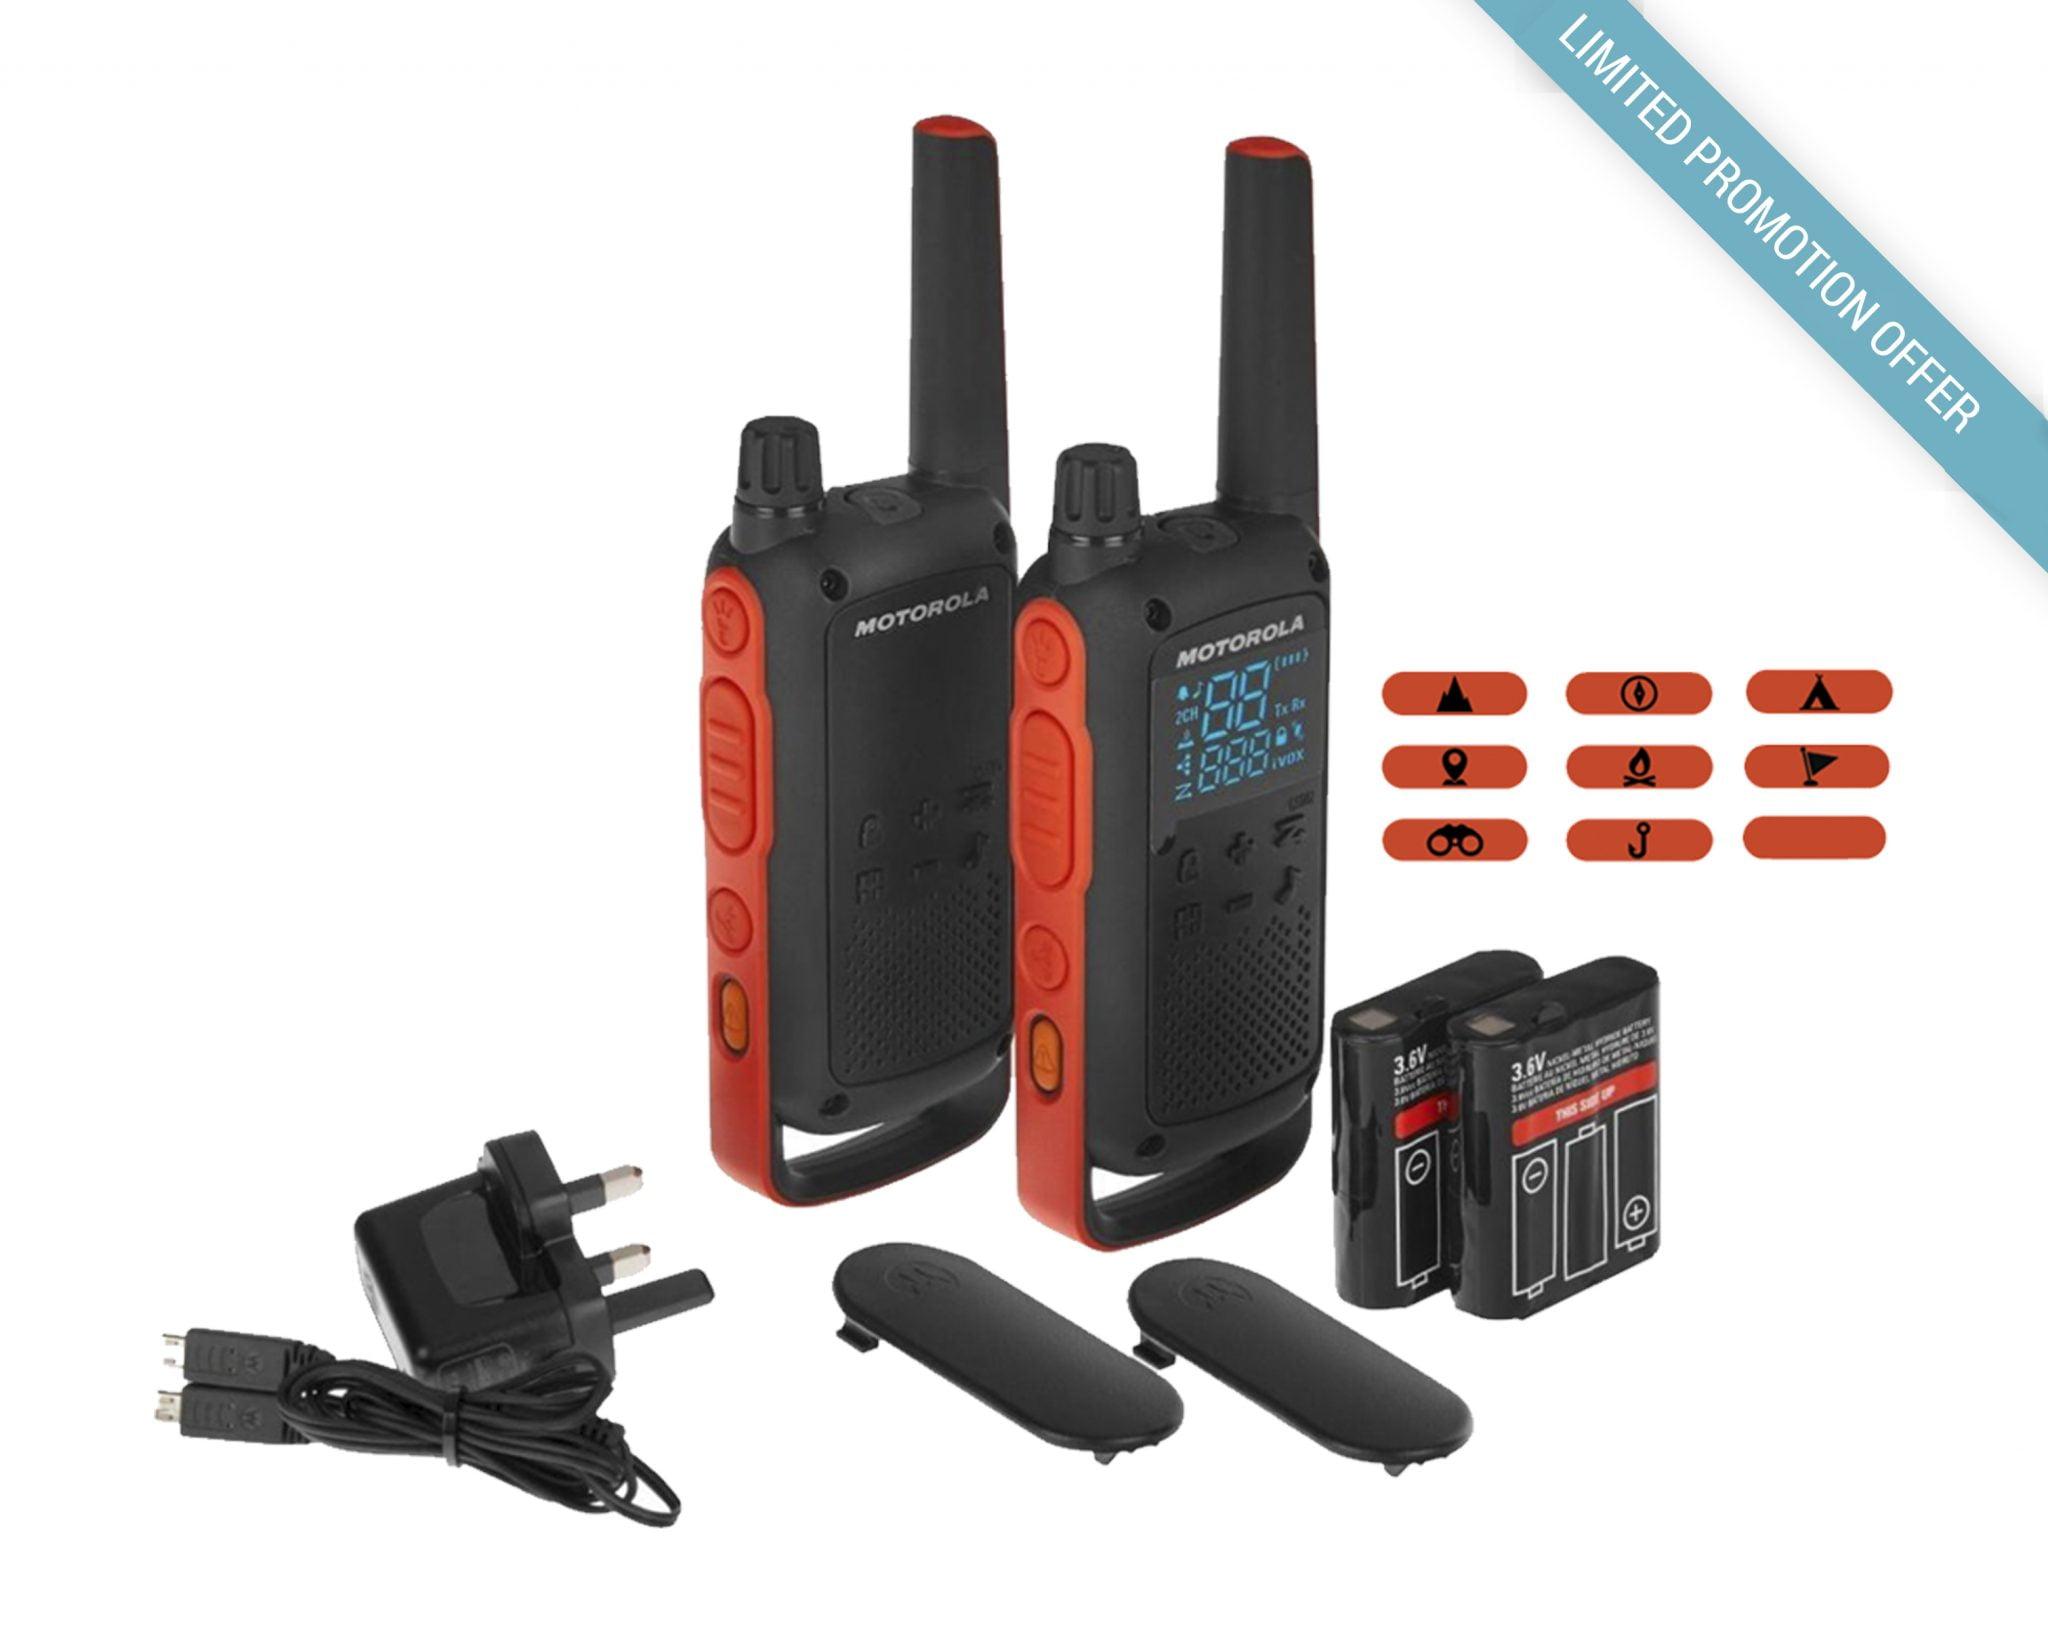 Motorola TALKABOUT Radios T82, Twin - Brentwood Communications